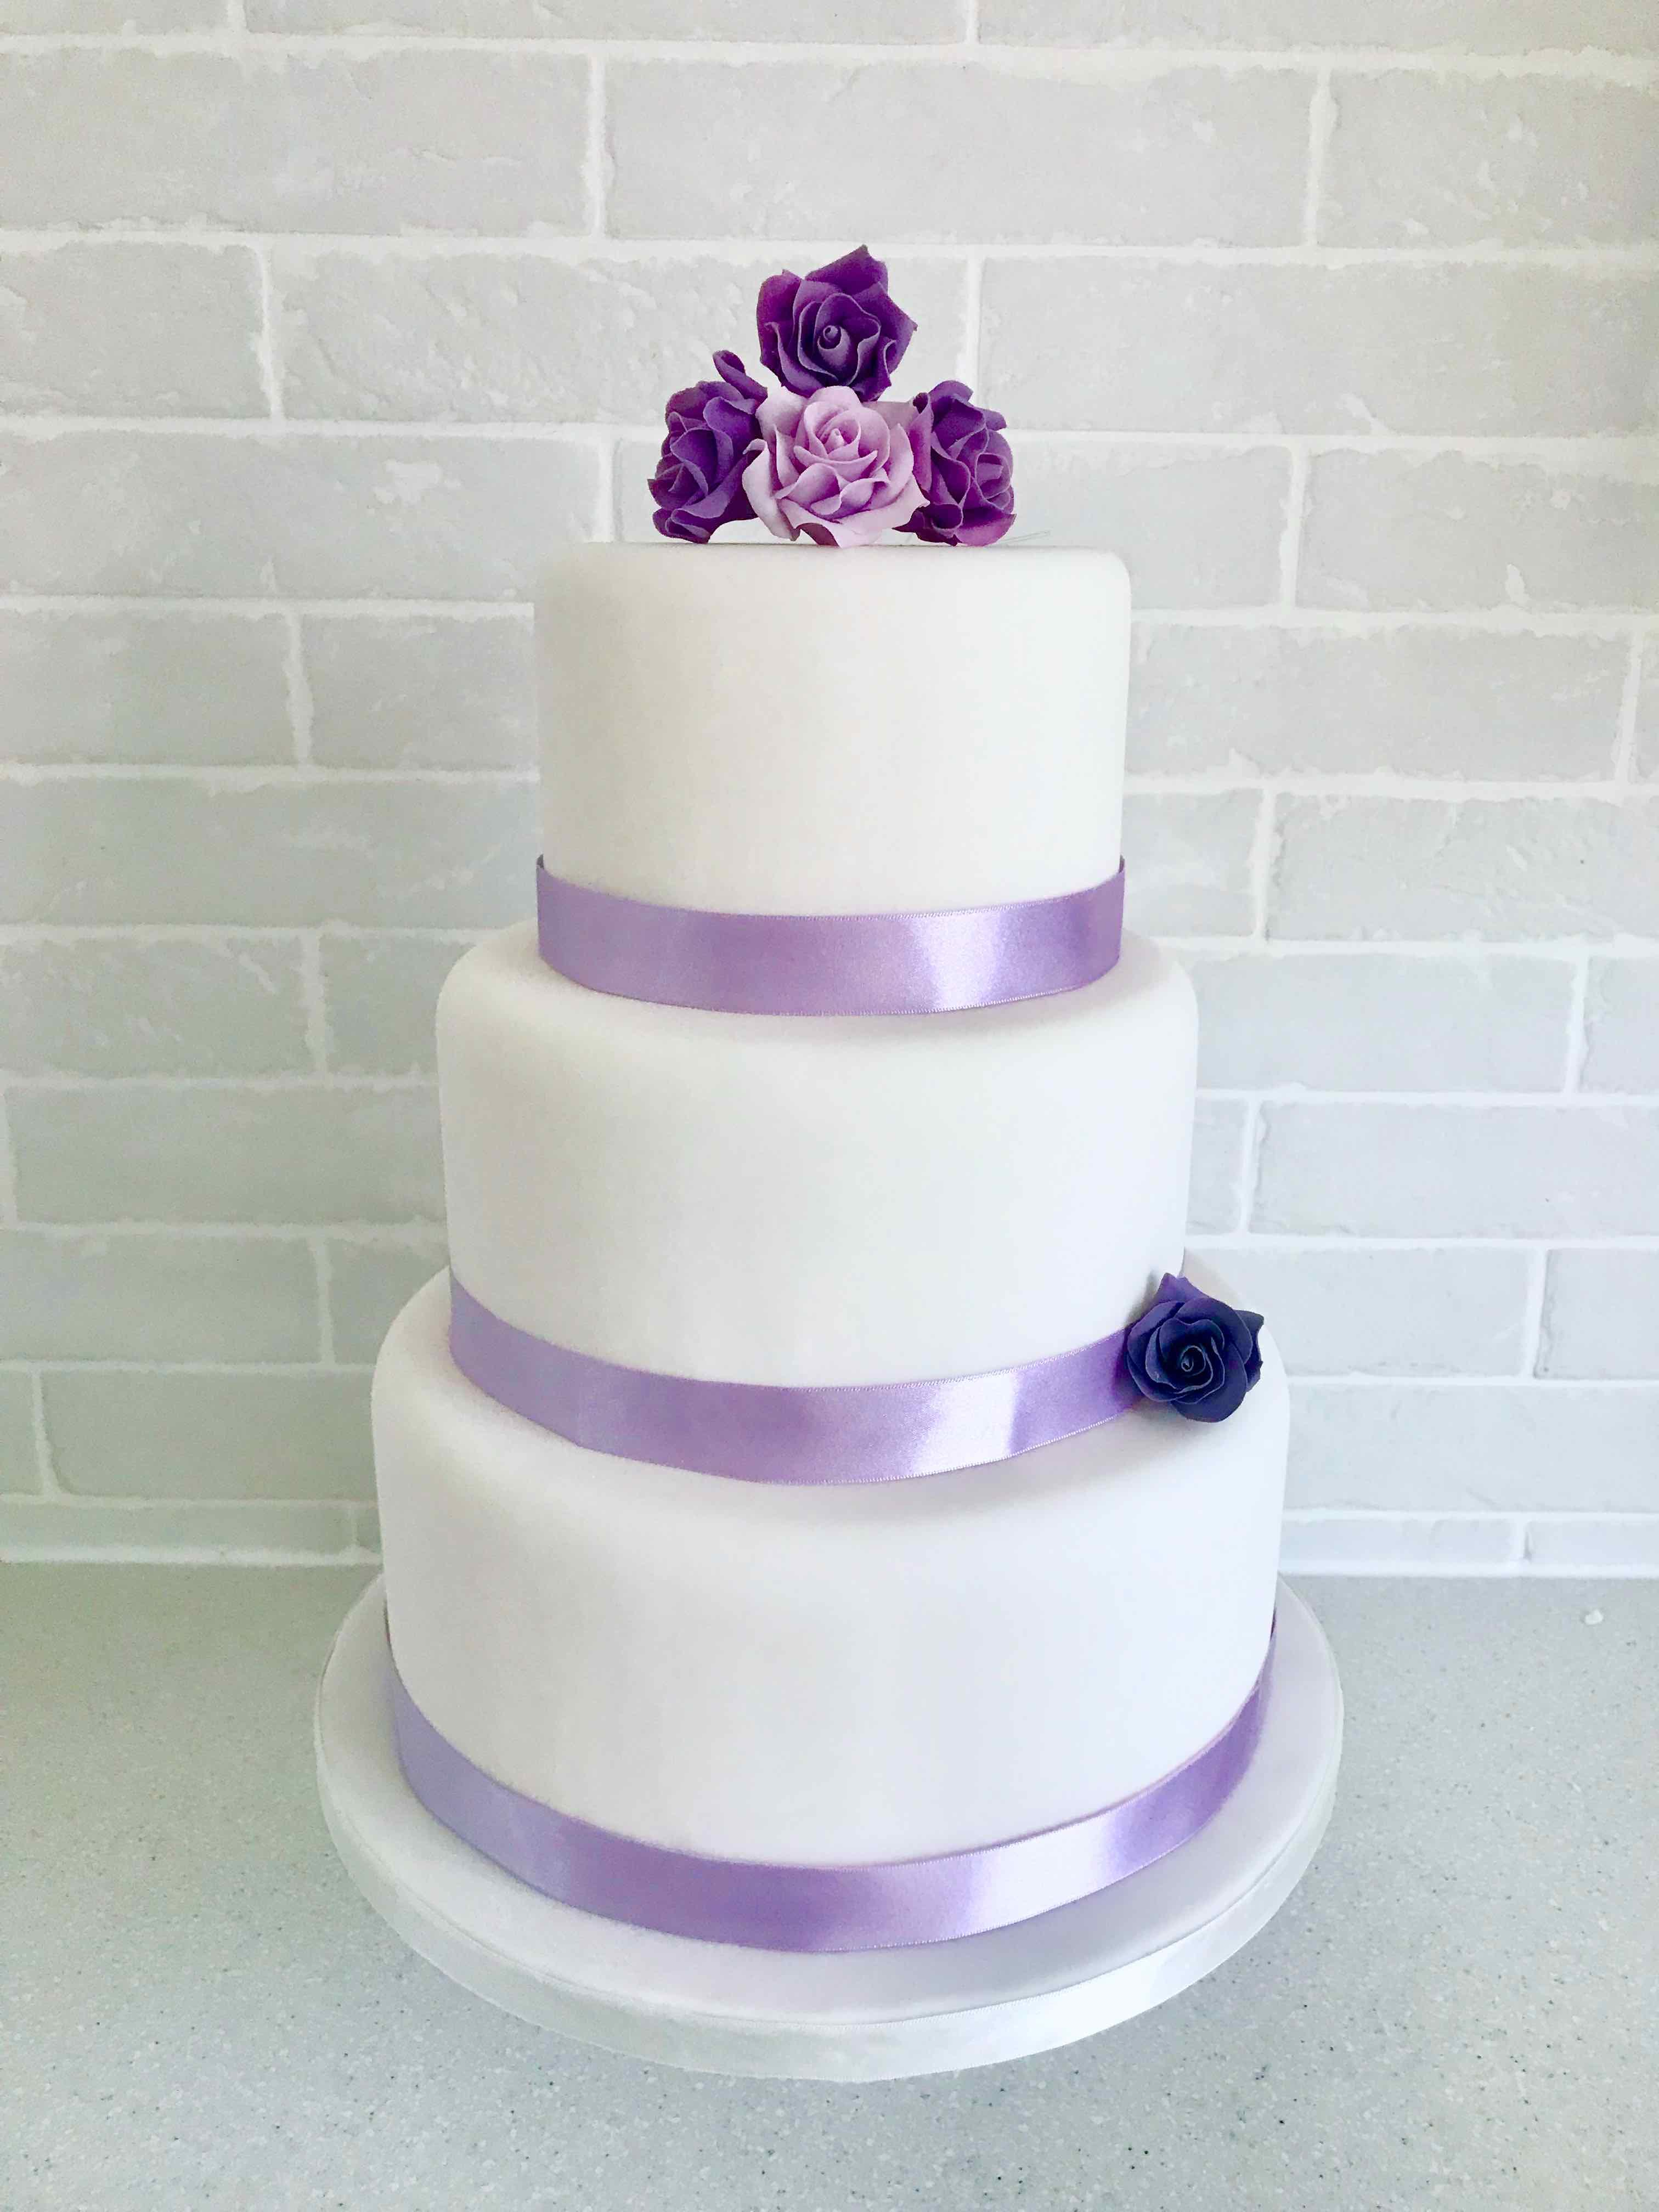 Serendipity Classic 3 Tier Wedding Cake Serendipity Cake Company